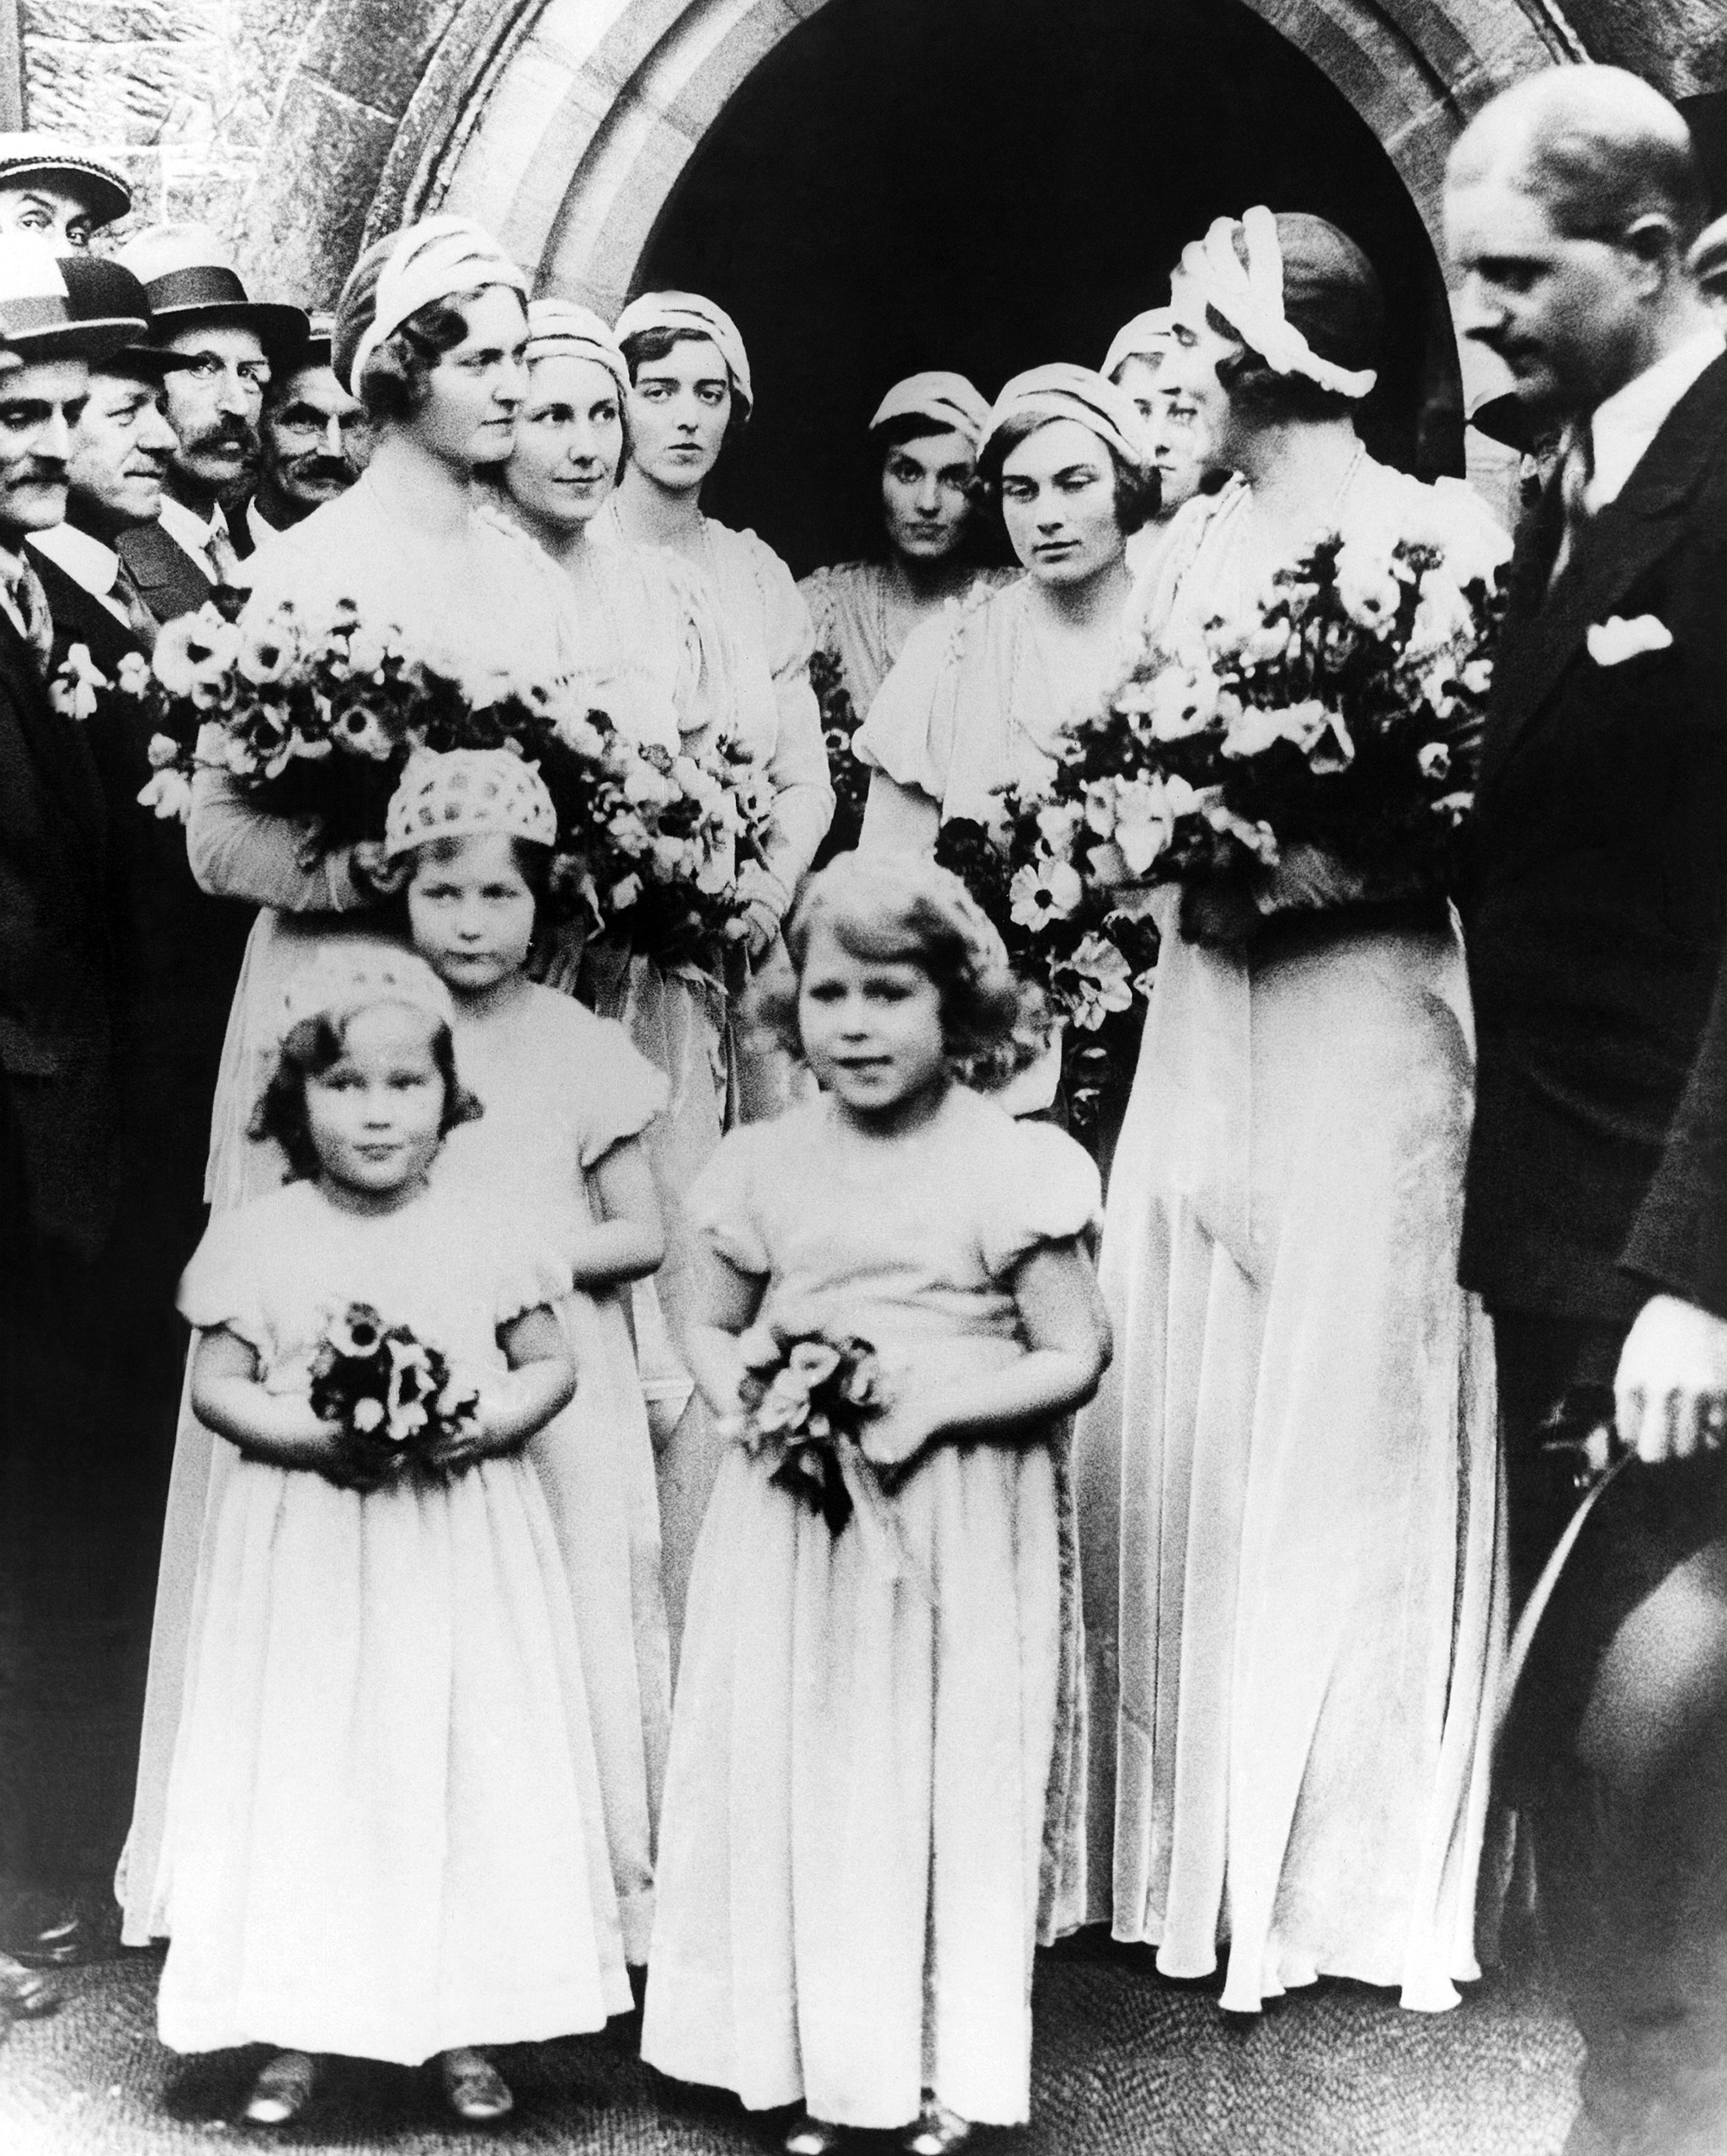 Bridal attendants Jennifer Bevan, Princess Elizabeth and Princess Ingrid of Sweden at Lady May Cambridge and Captain Henry Abel Smith's wedding on Oct. 24, 1931.